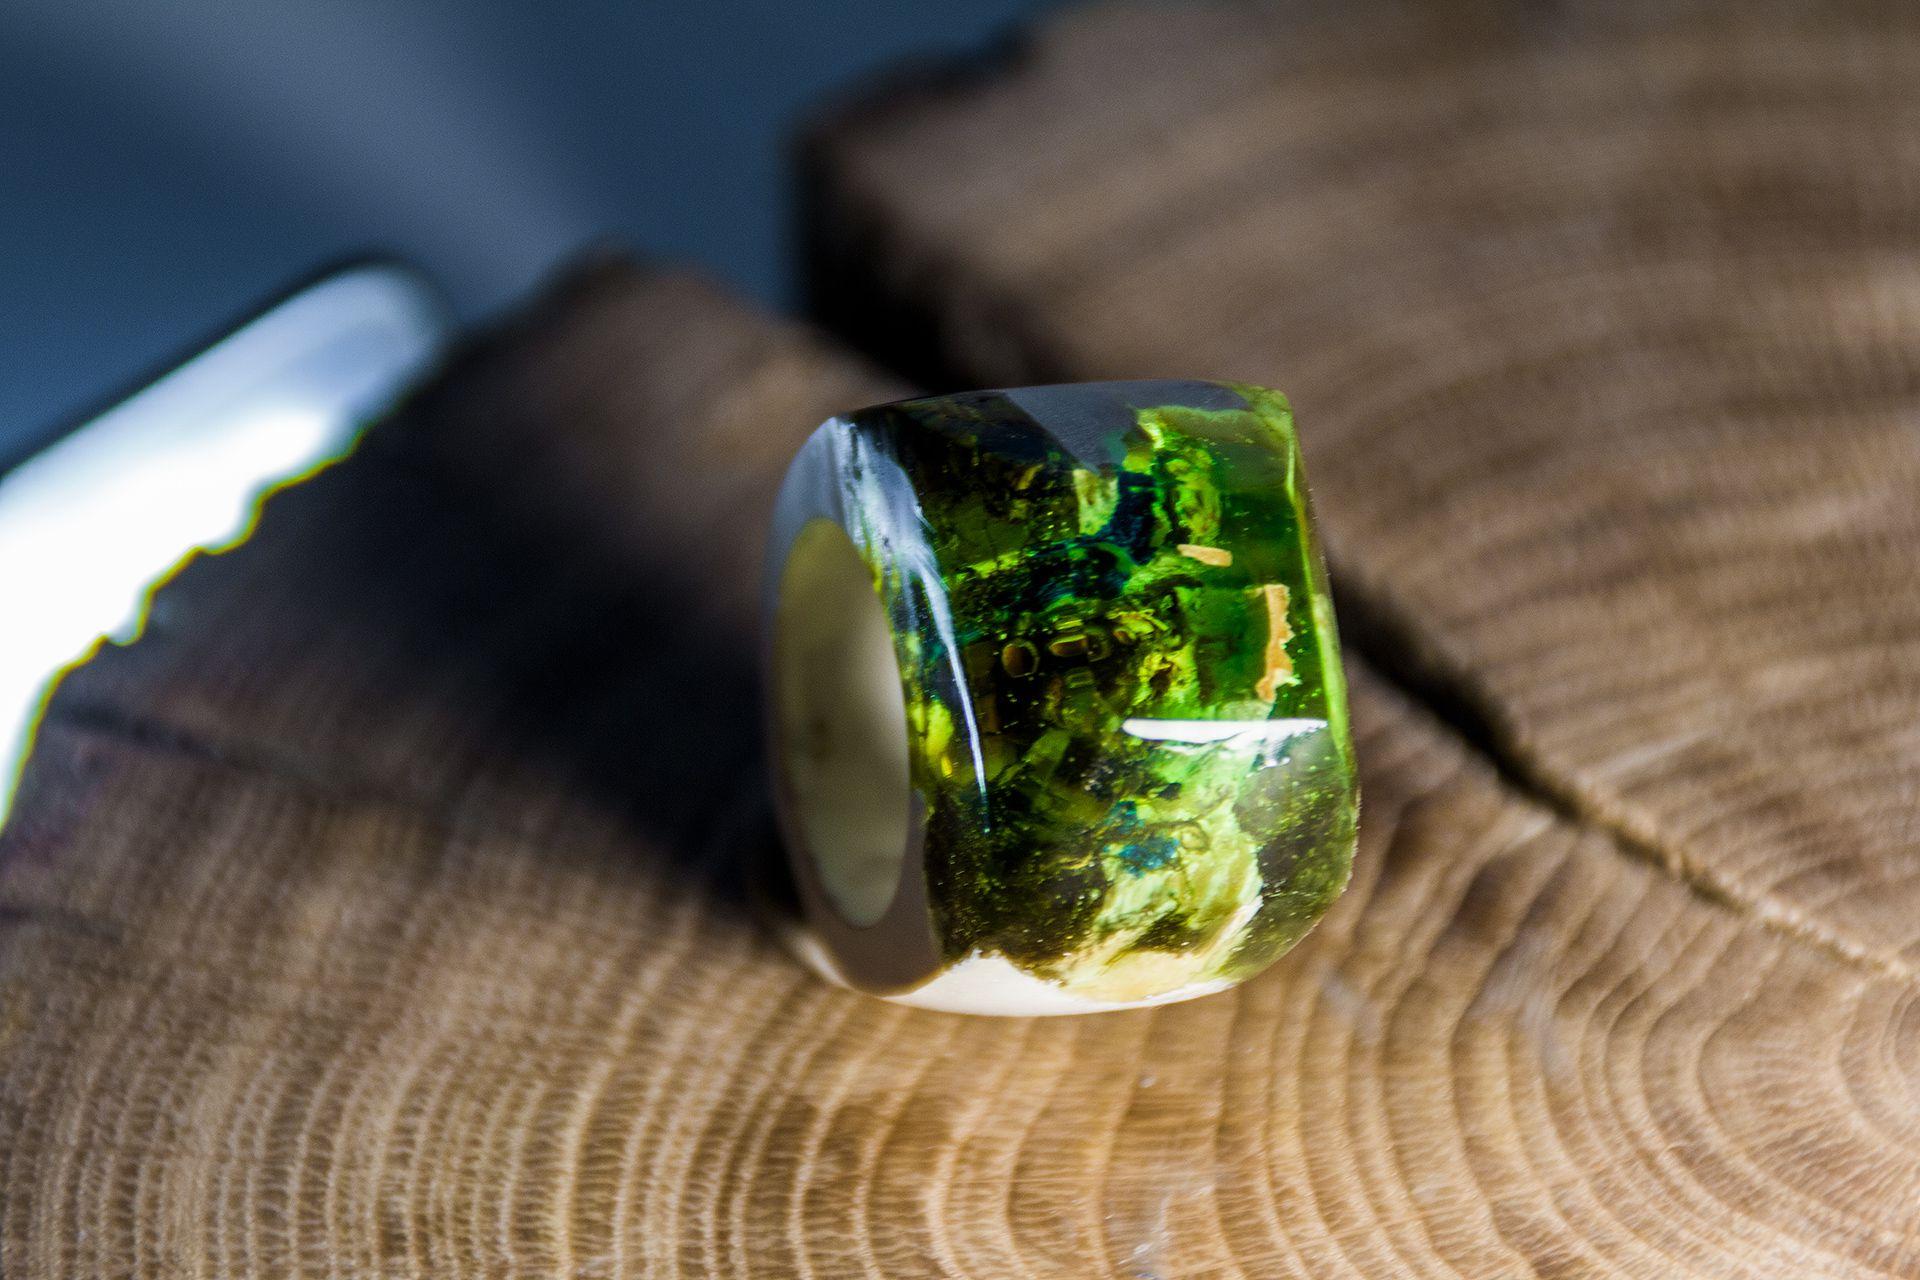 wooden olyaki подарок ручнаяработа смола handmade необычныйподарок ювелирная кольцаиздереваиювелирнойсмолы деревянныекольца epoxyresin jeweleeryresin jewellery woodenribgs